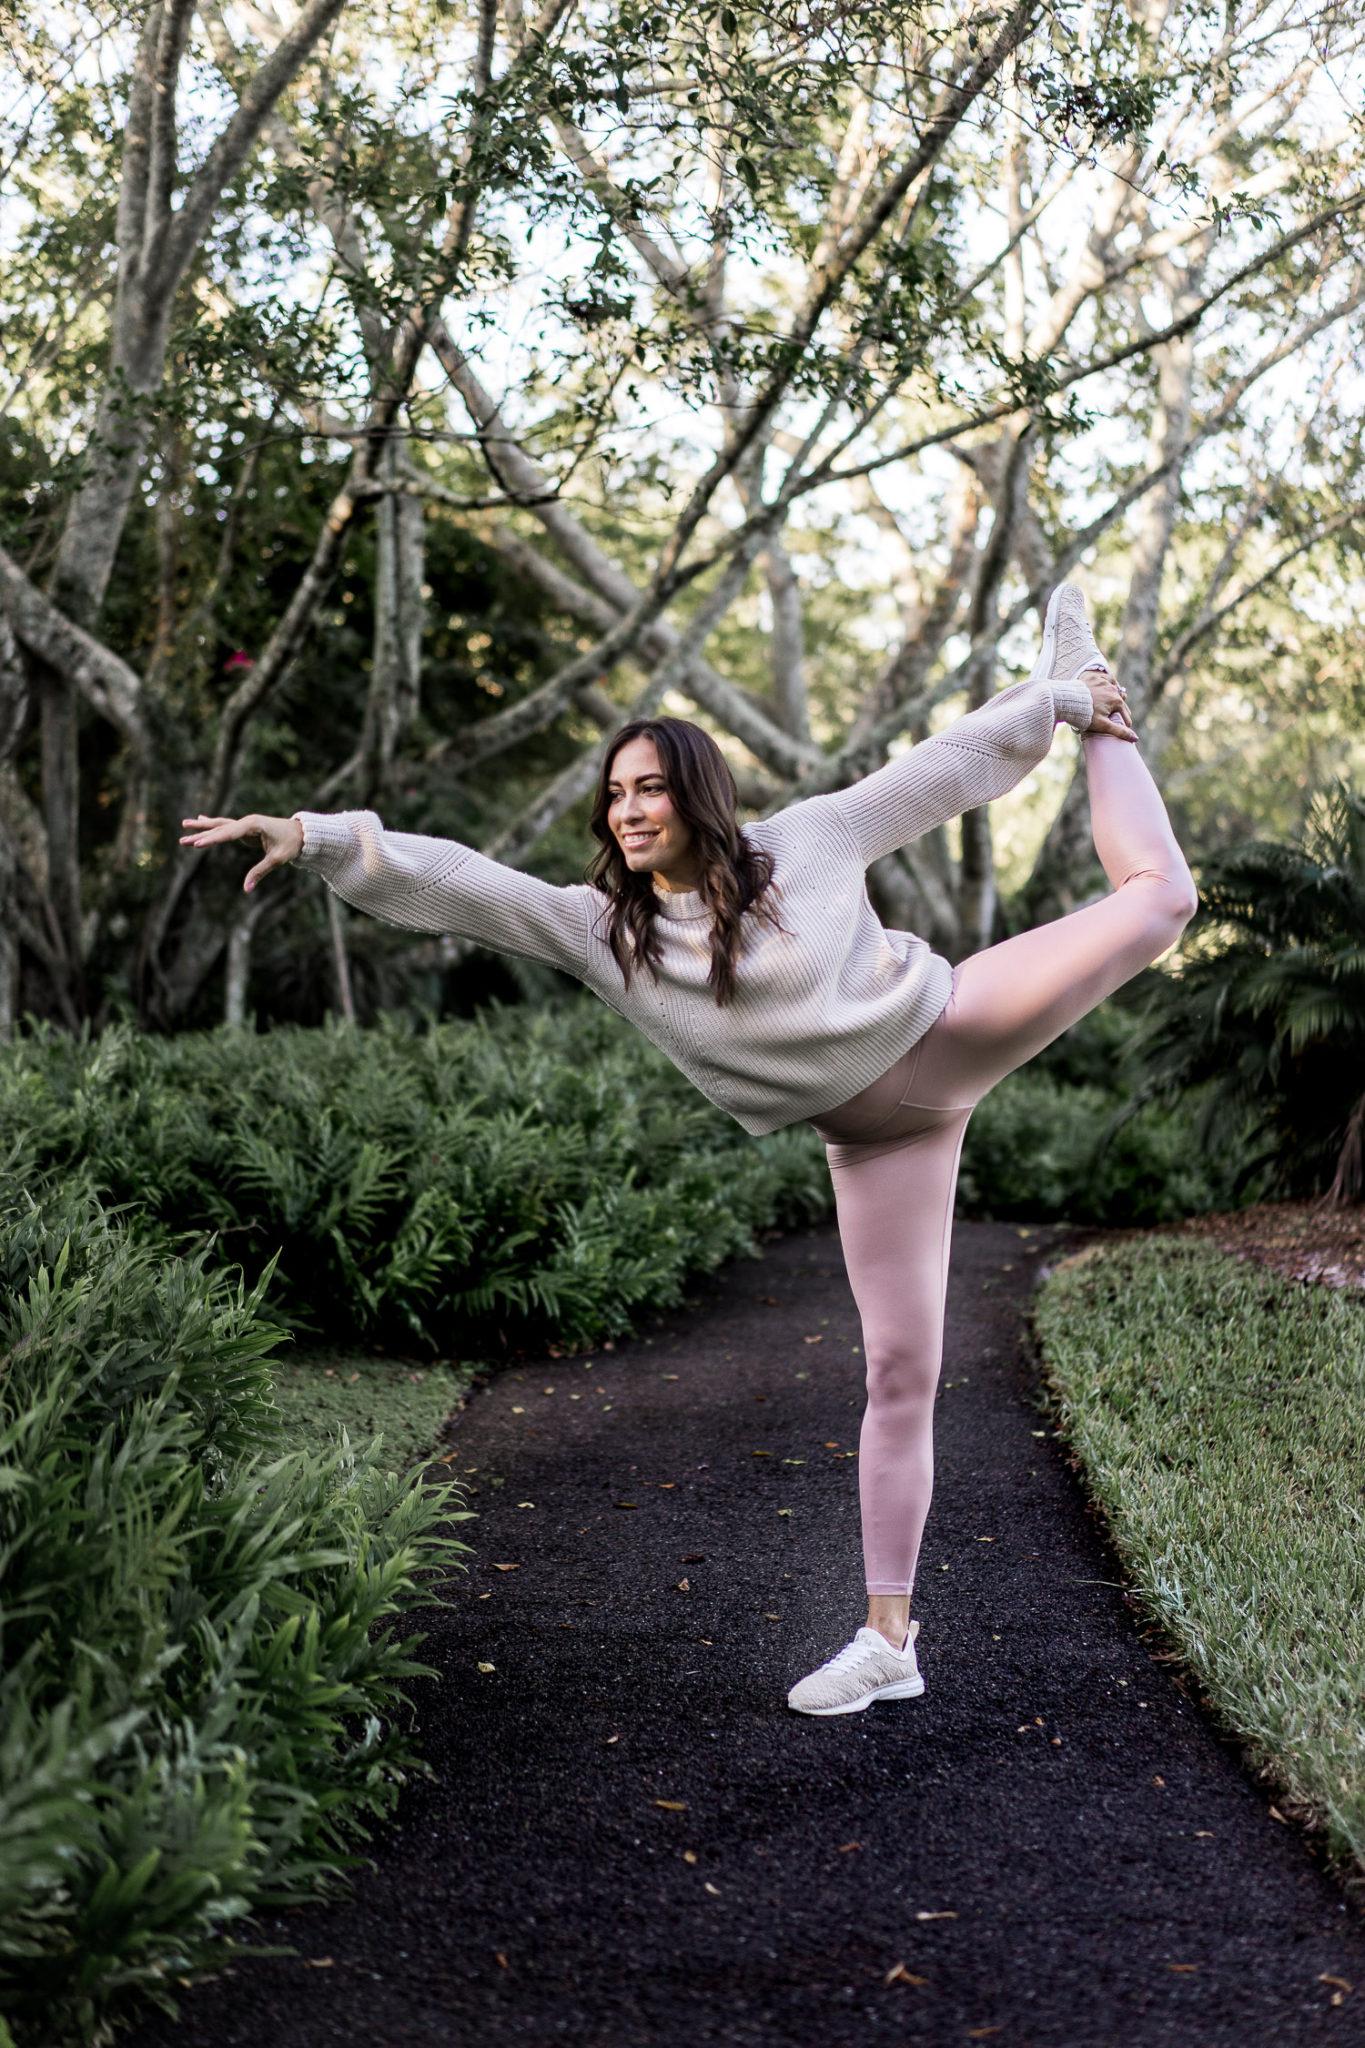 547f5774e0b8 athleta-leggings-athleta-outfits-elation-shimmer-tight -wool-cashmere-lucca-sweater-aglamlifestyle-athleisure-style-4